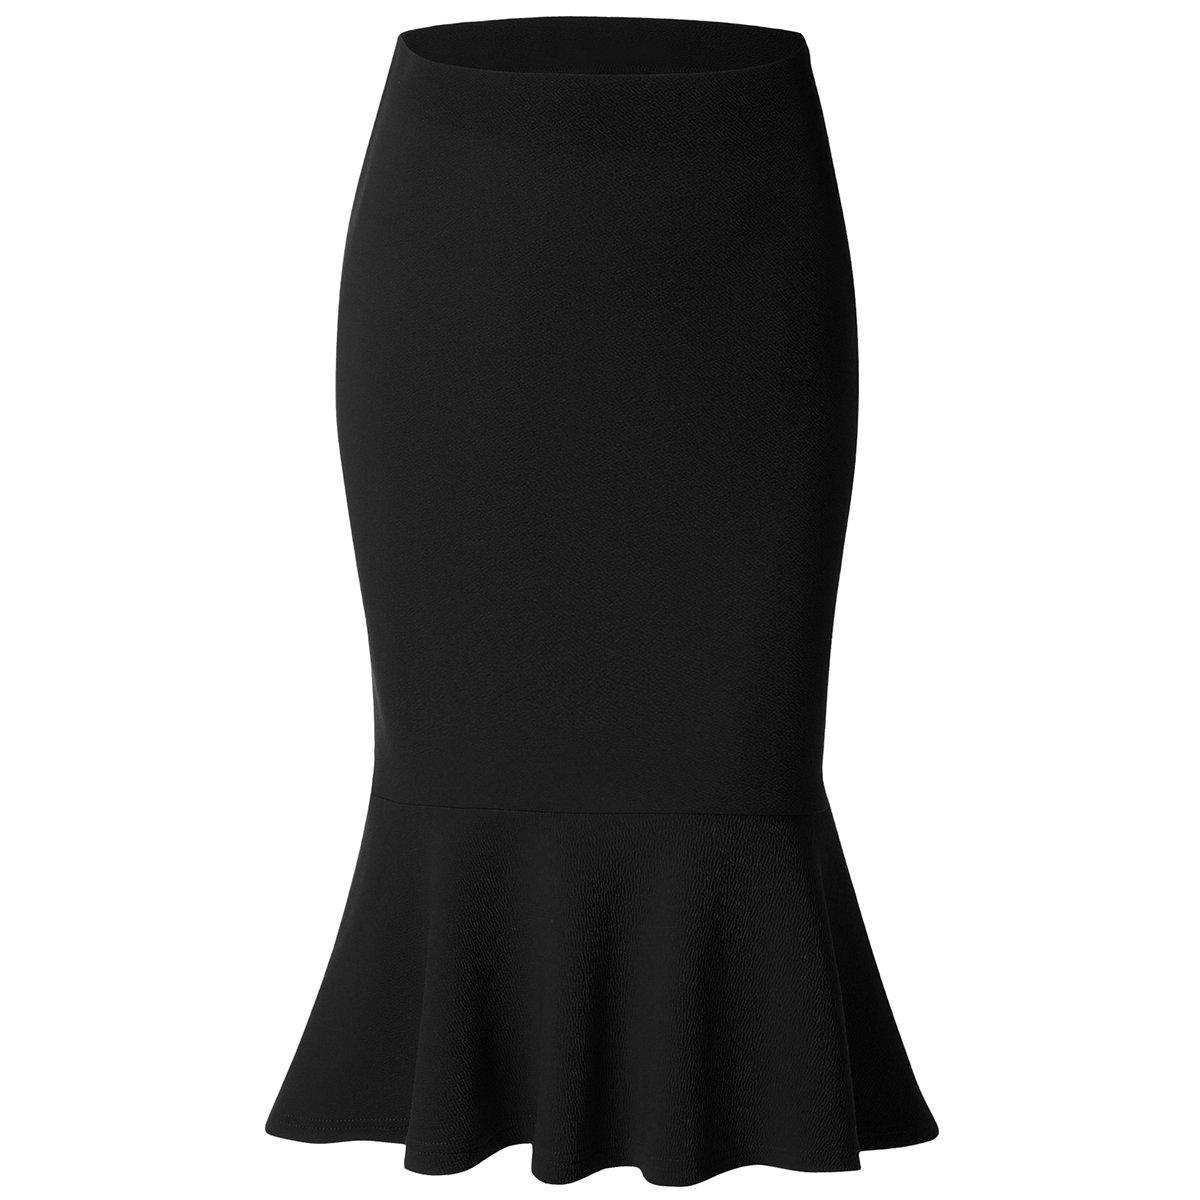 Women Mermaid Skirt High Waist Fishtail Hem Solid Bodycon Pencil Midi Skirts, Black, X-Large